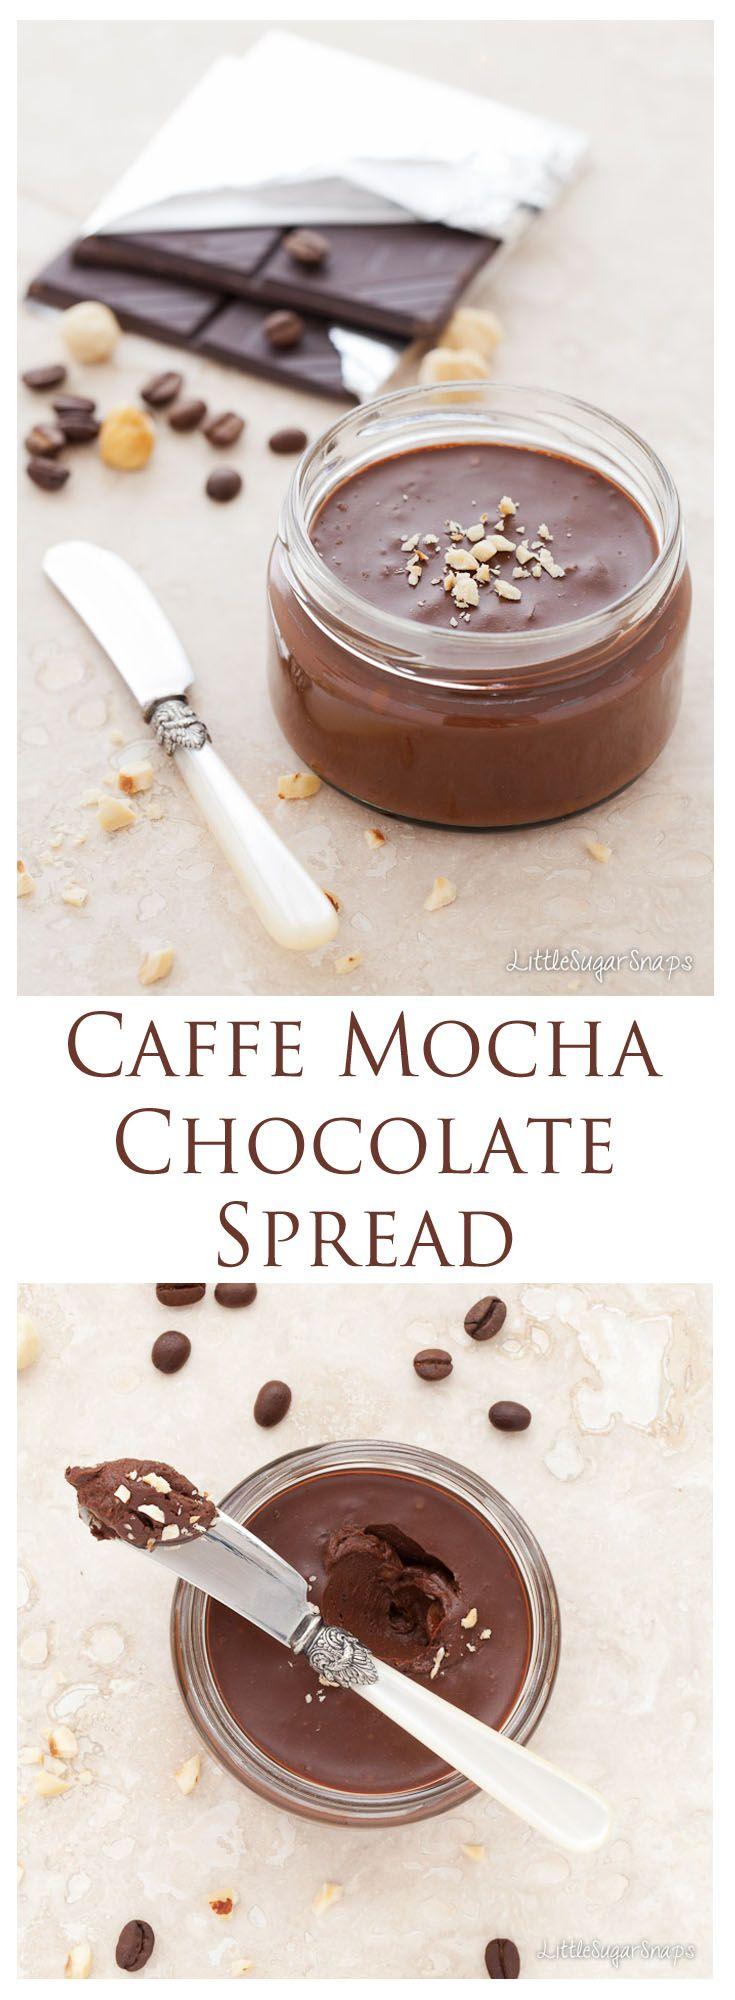 Caffe Mocha Chocolate Spread